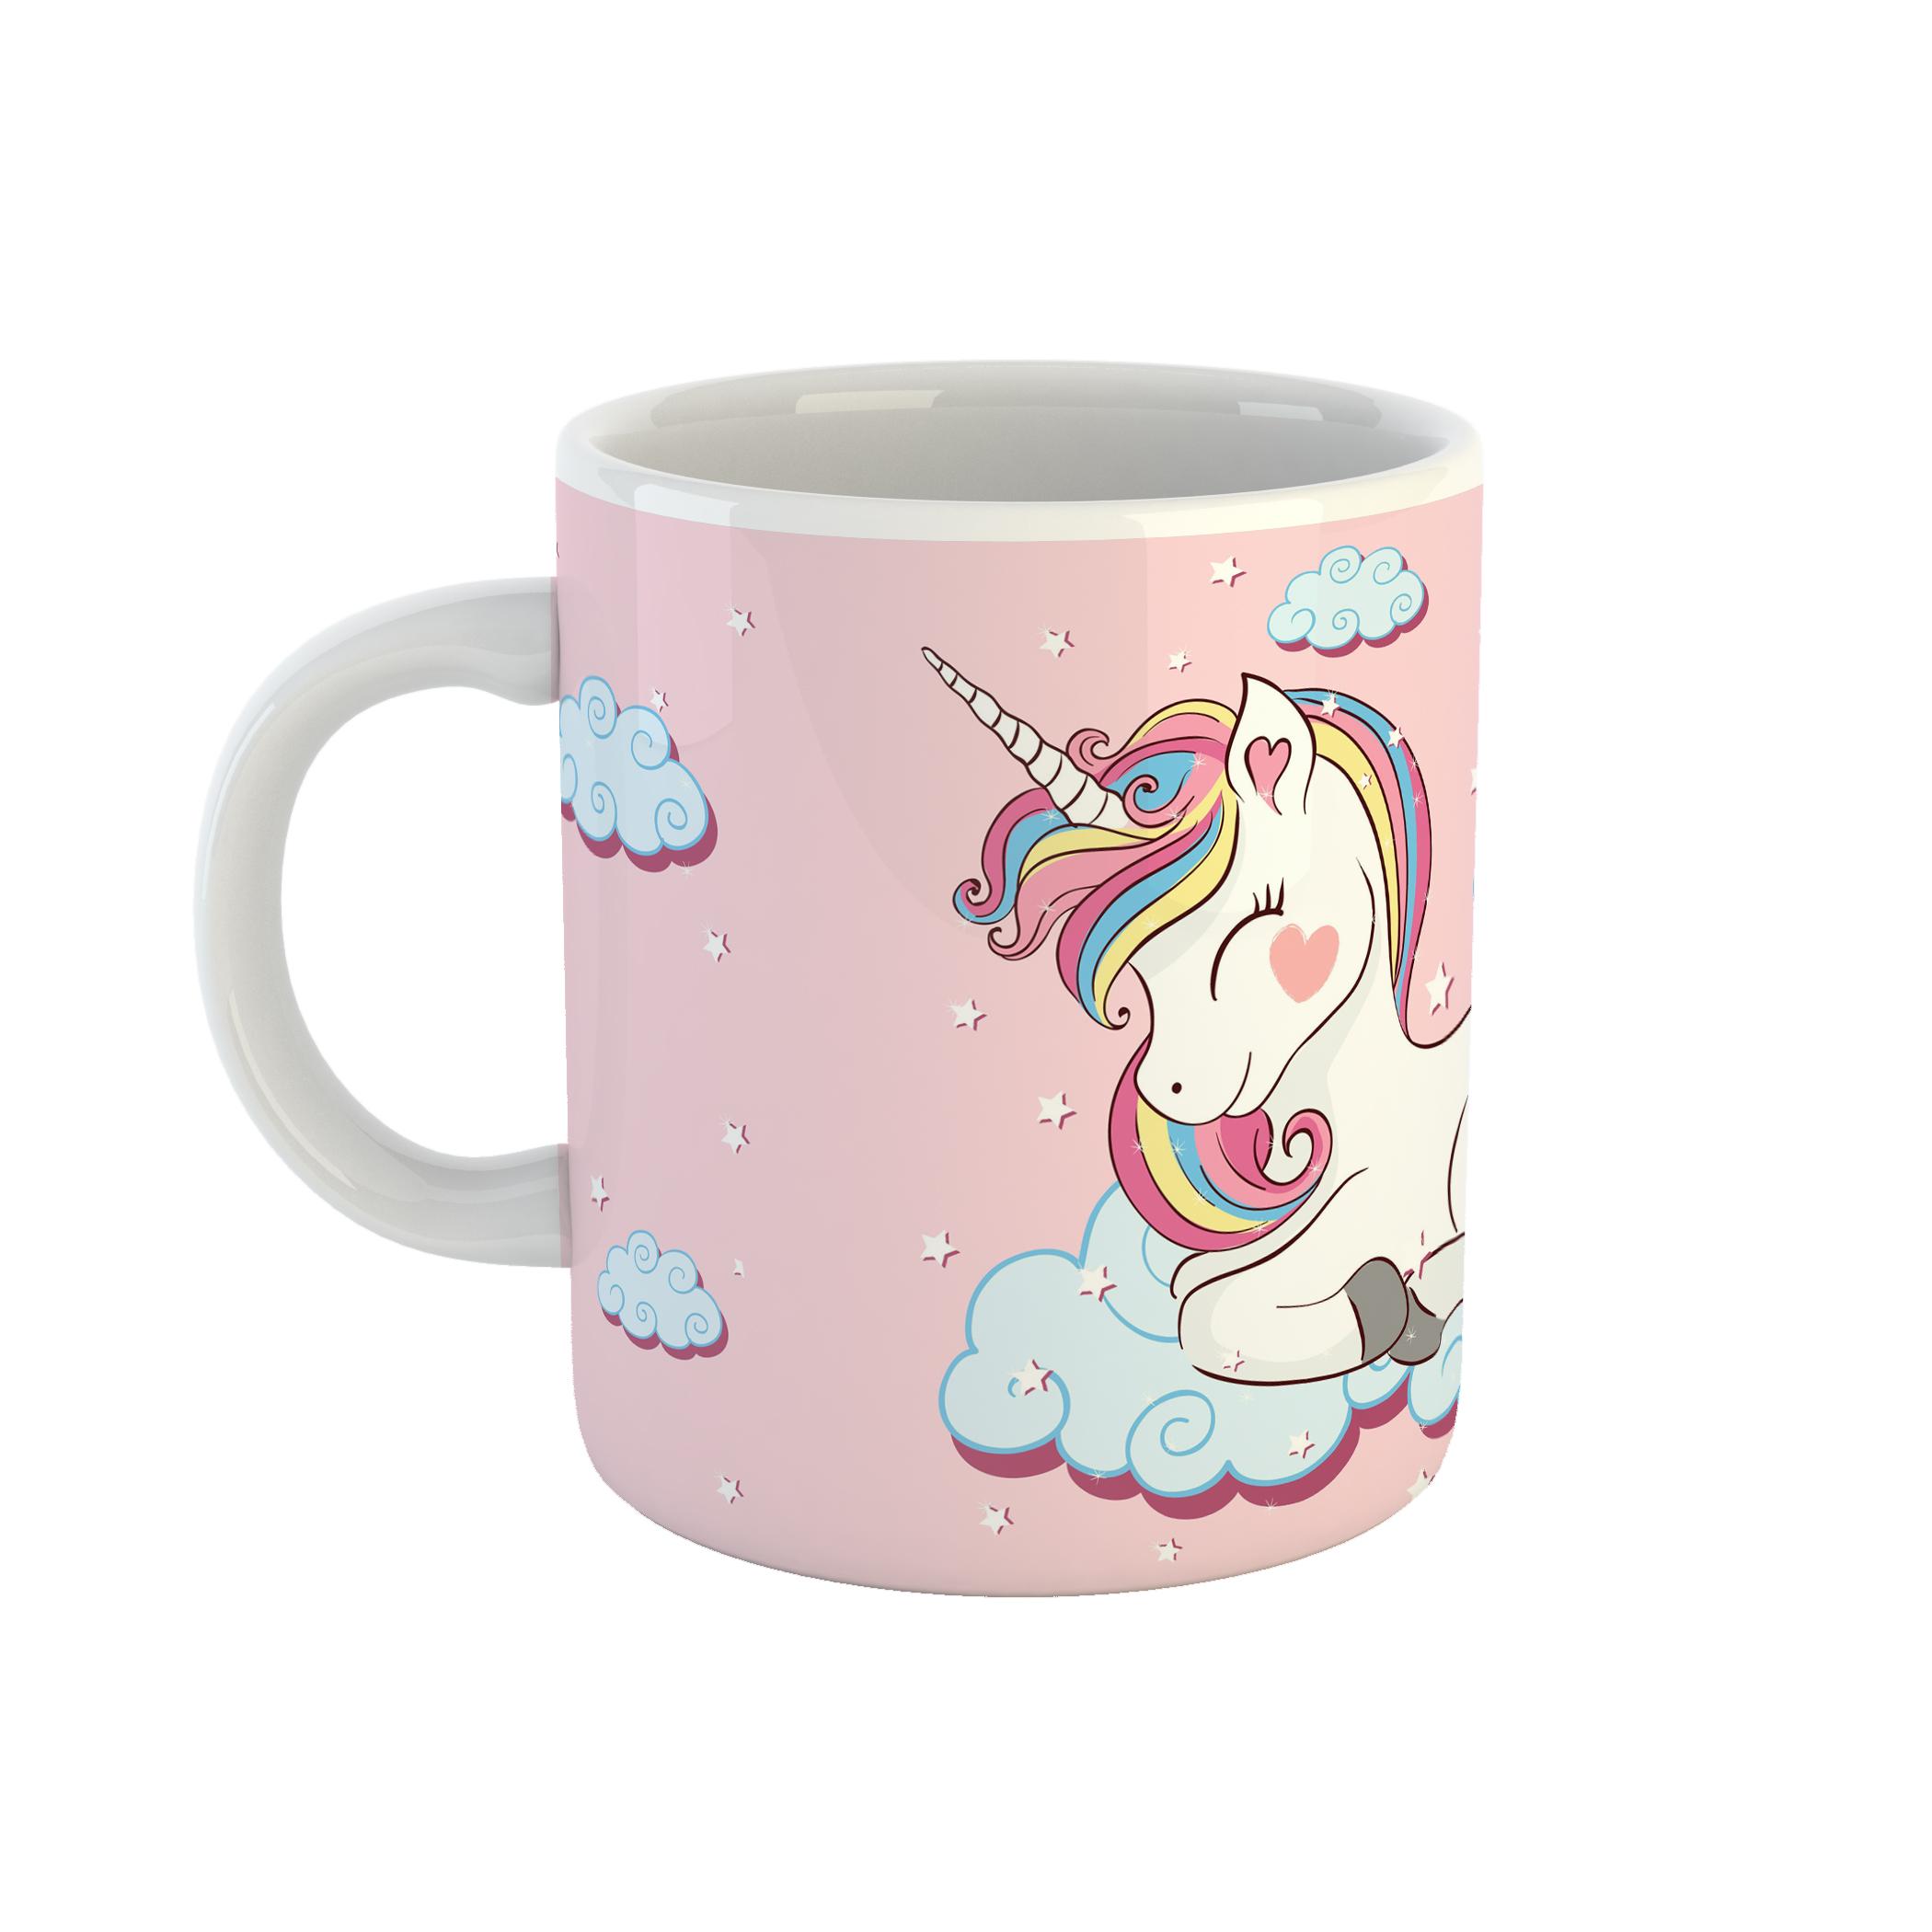 ماگ طرح اسب تکشاخ مدل unicorn کد 11